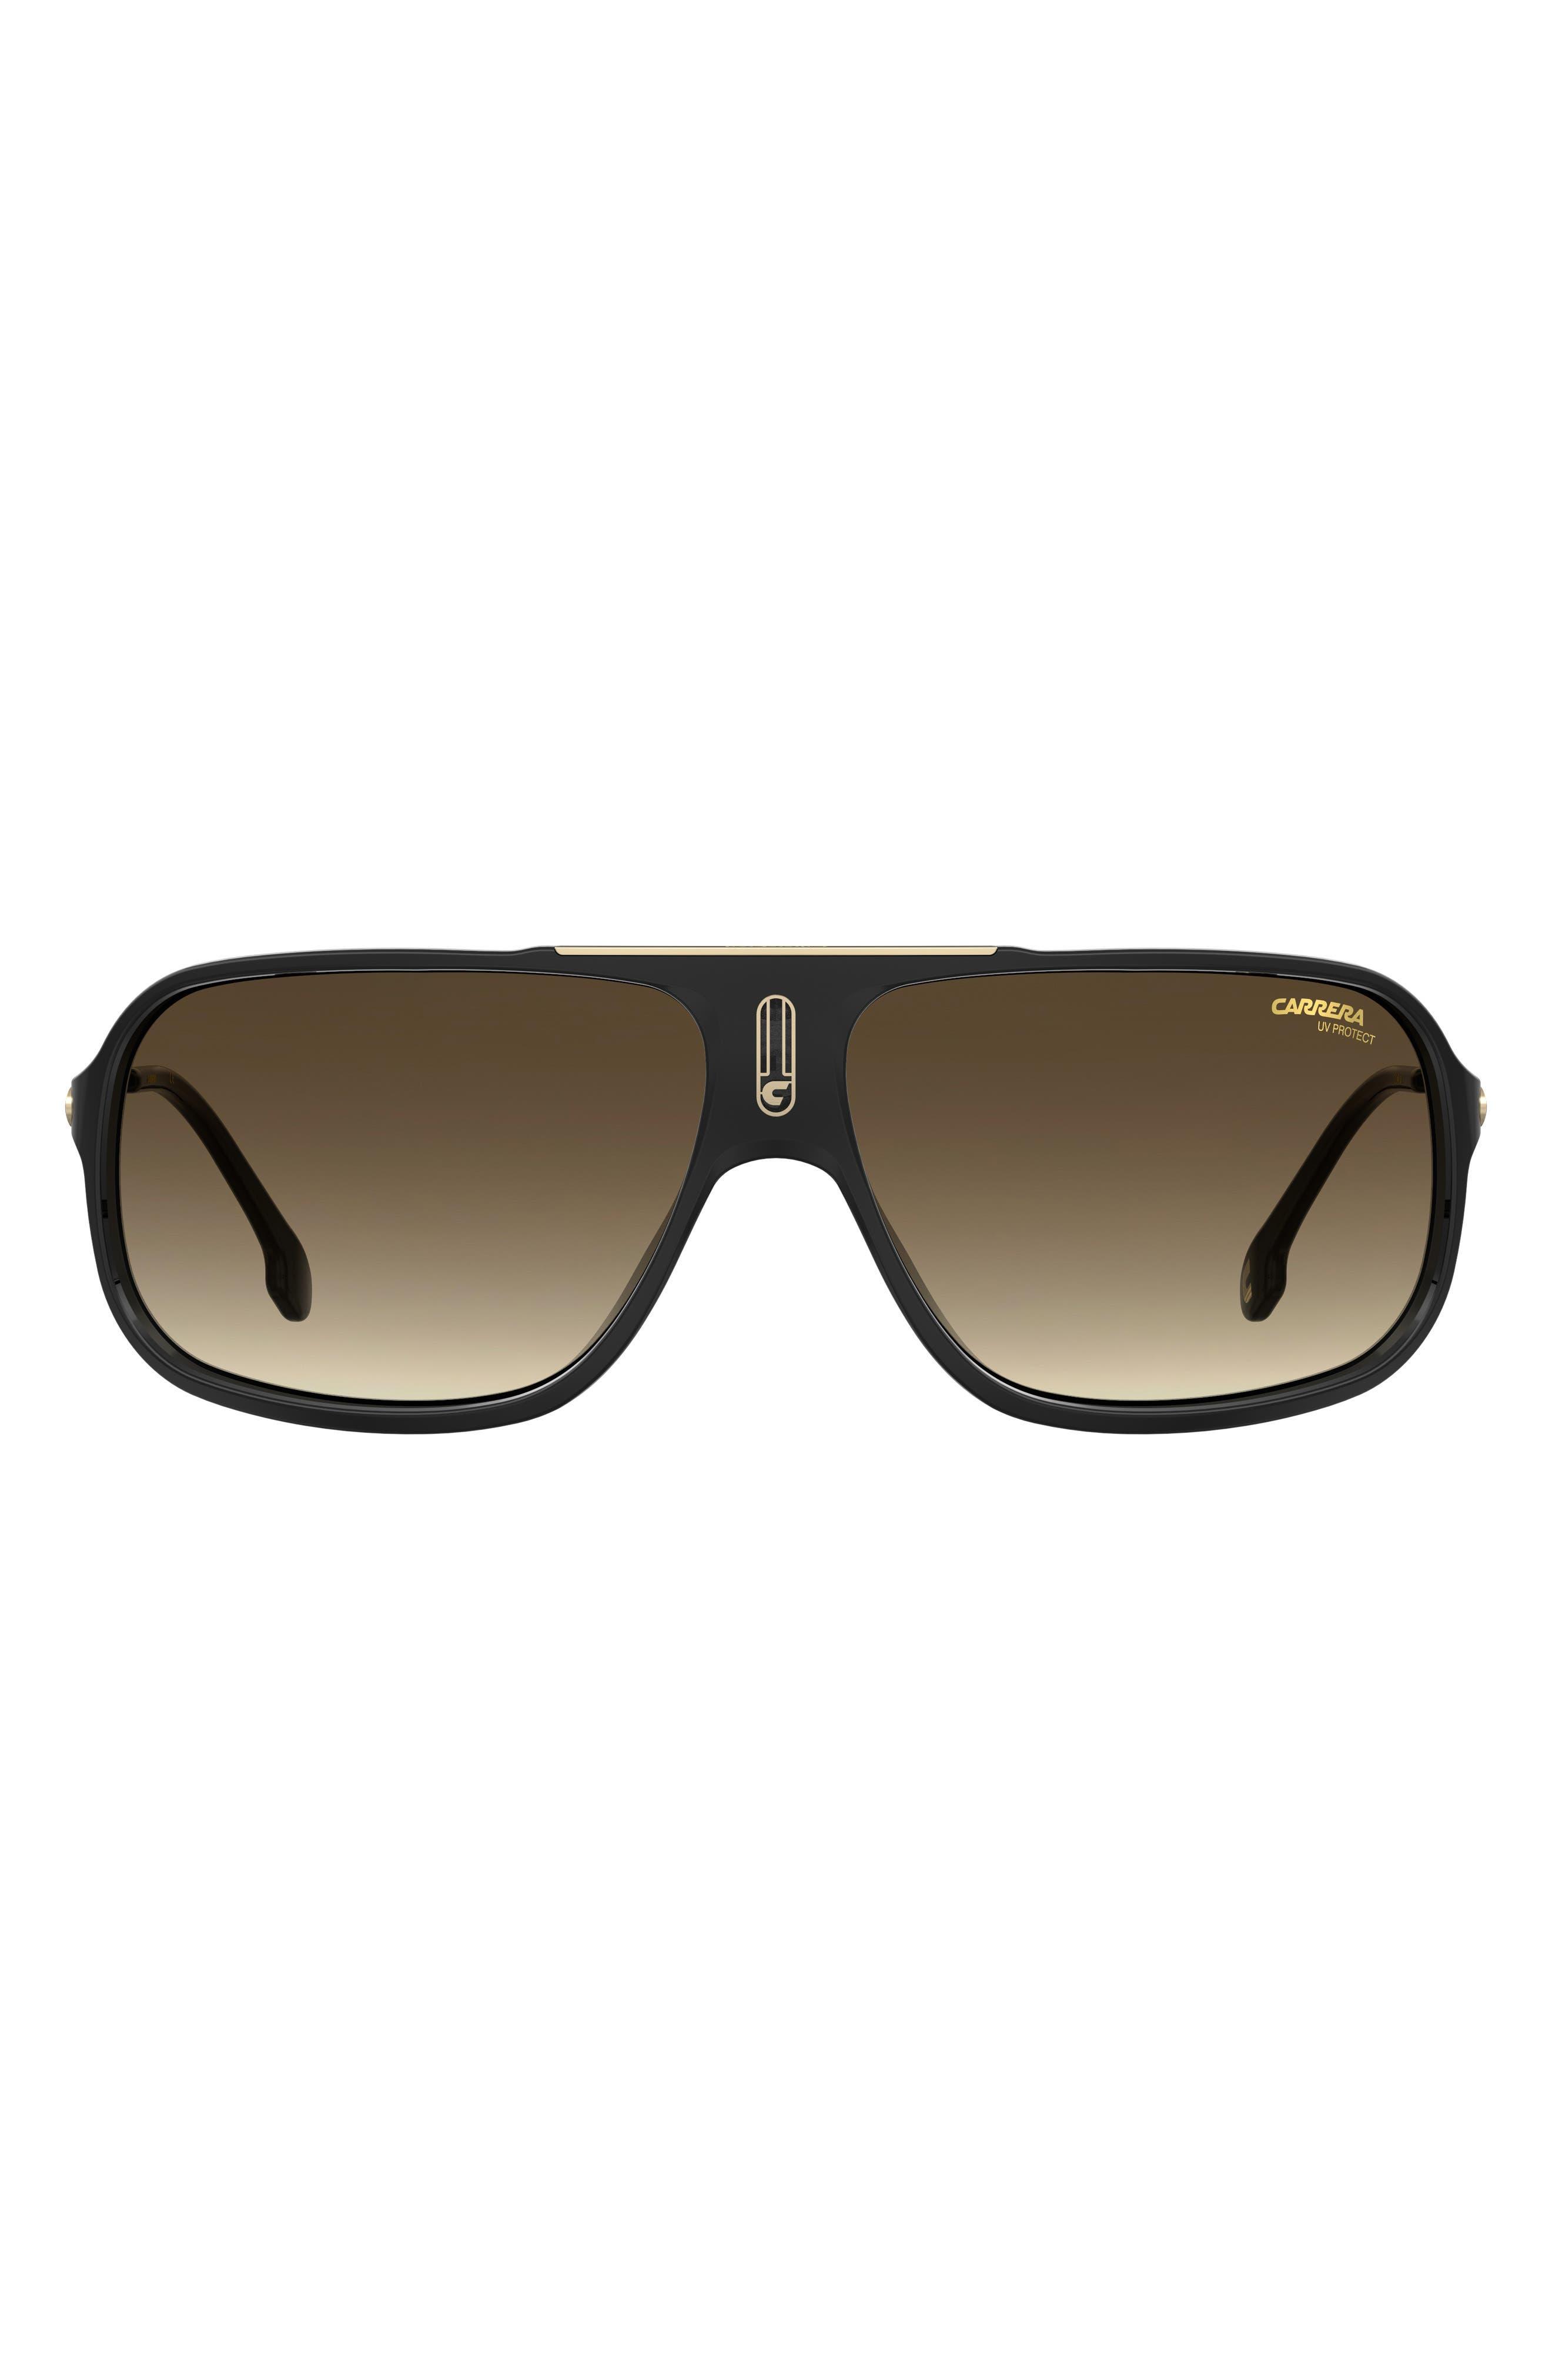 64mm Polarized Rectangle Sunglasses